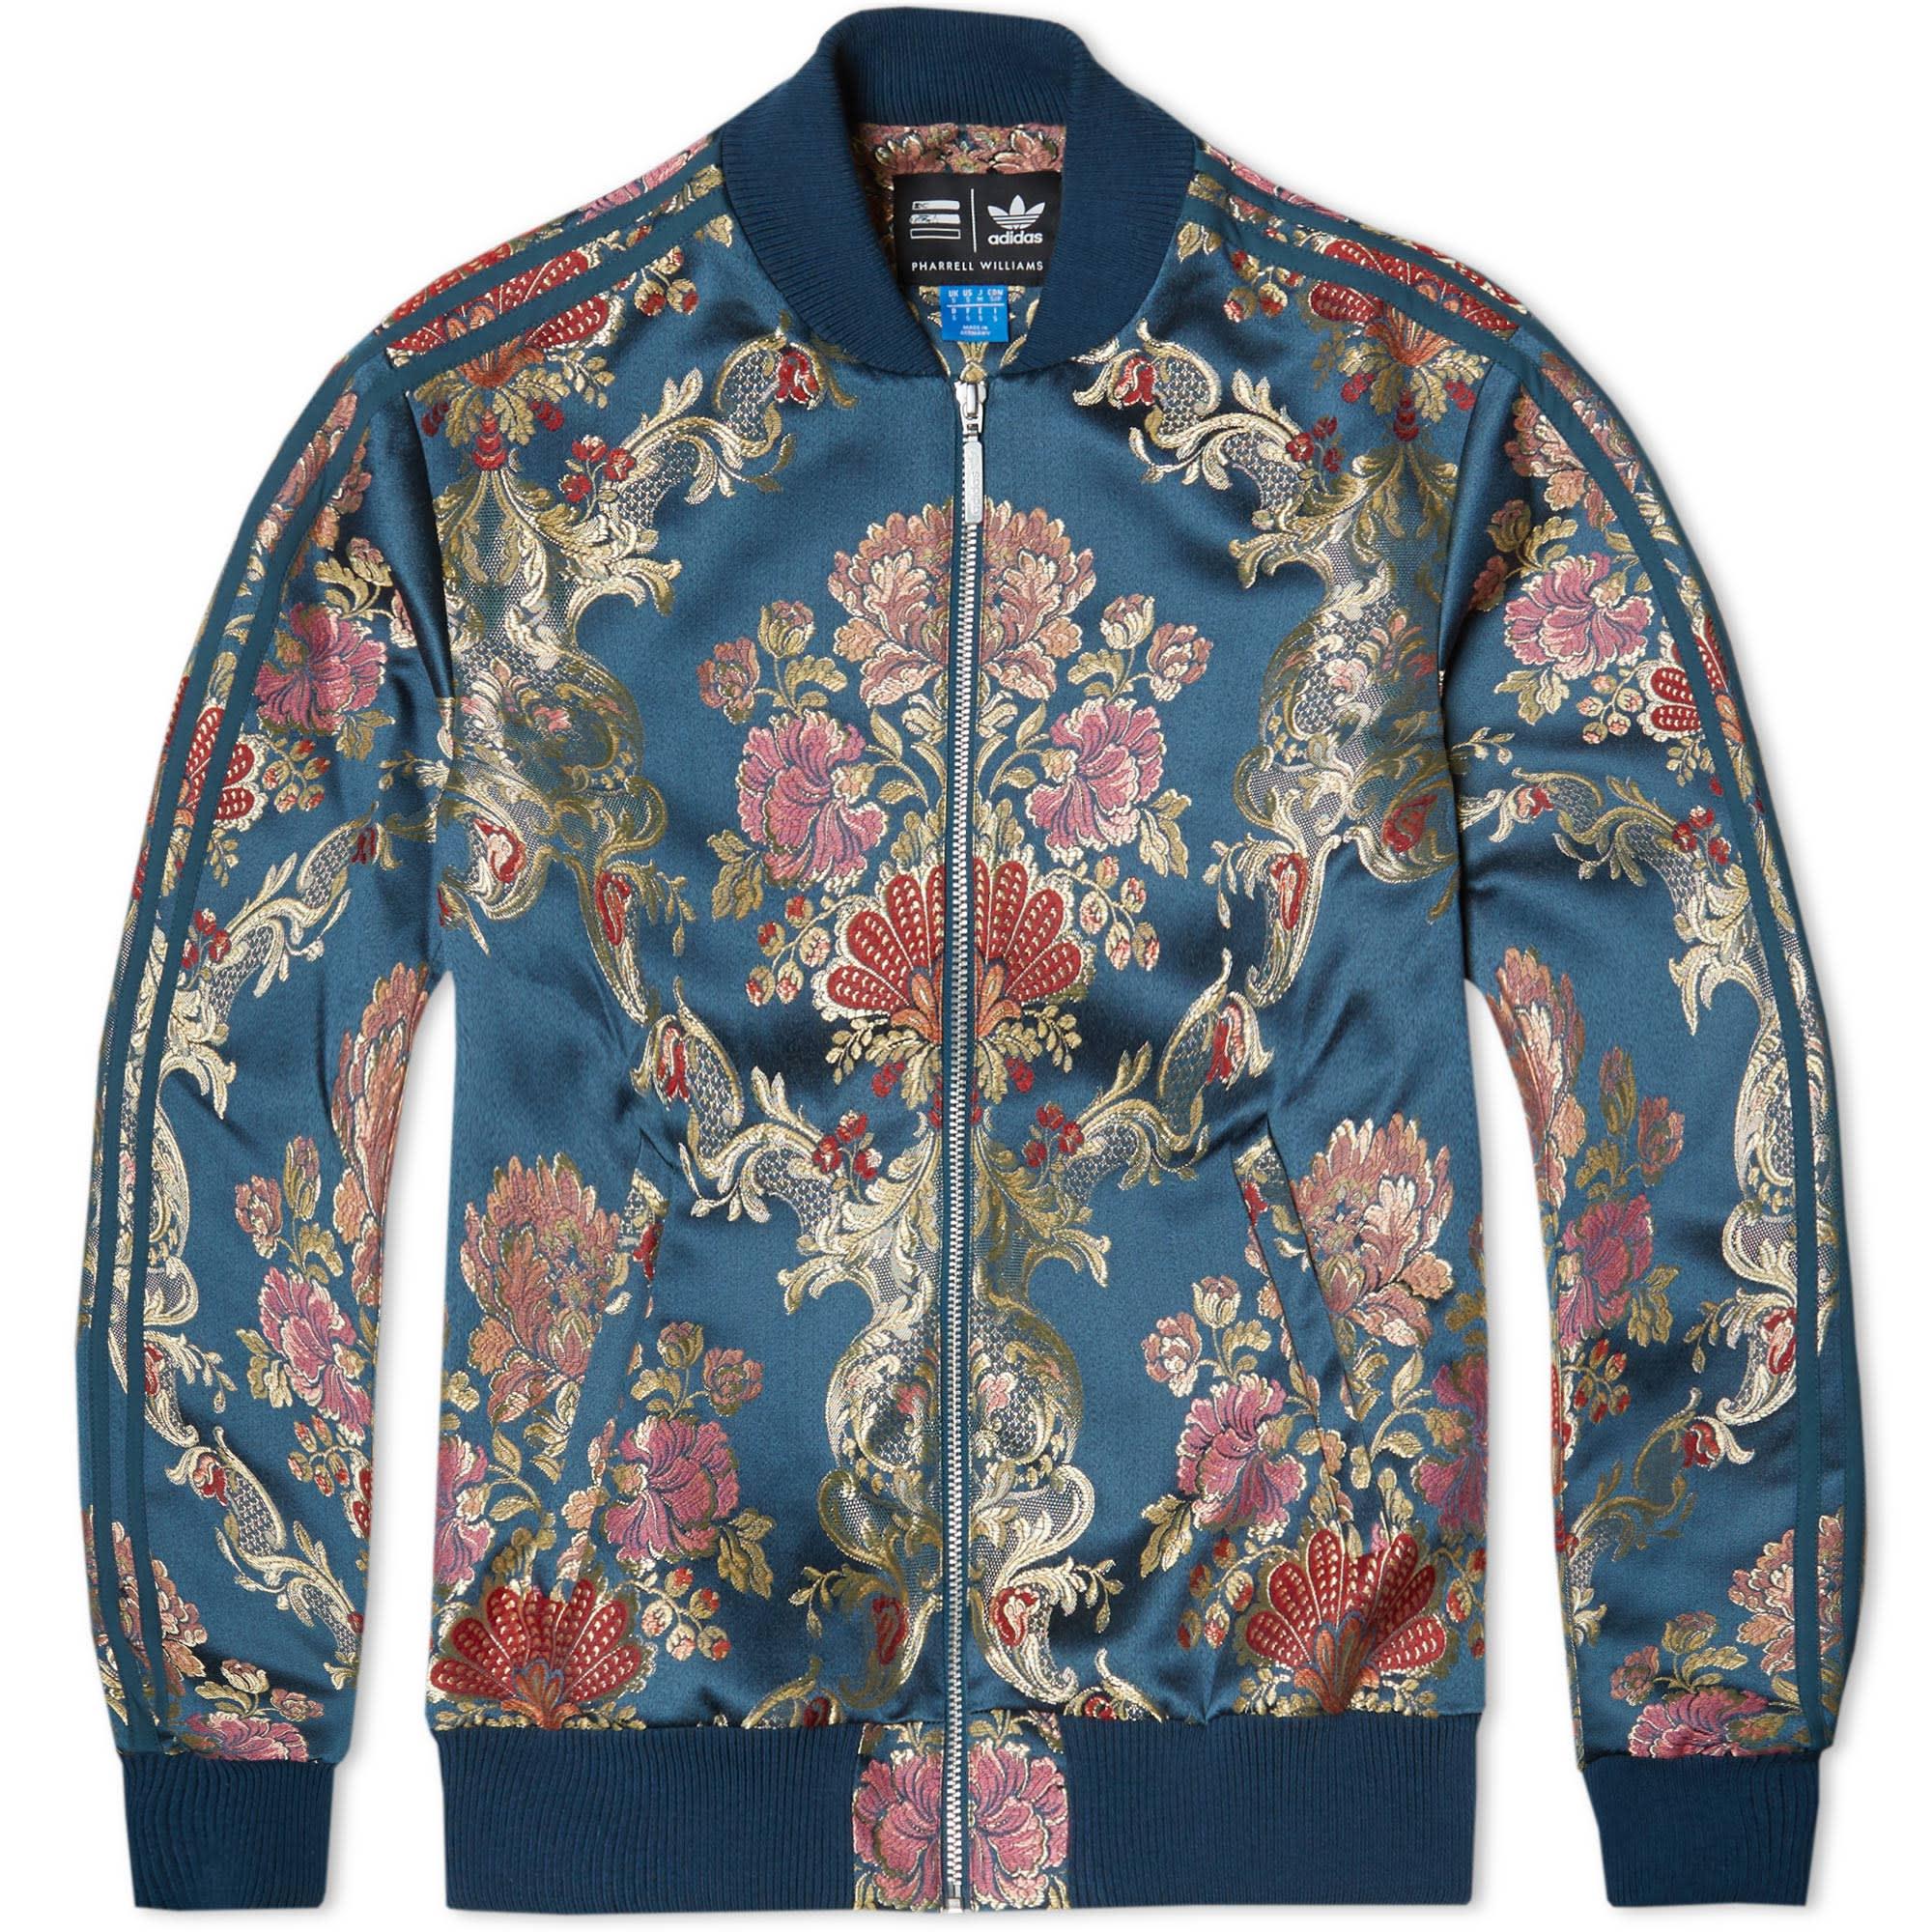 size 7 outlet new styles Adidas x Pharrell Jacquard Track Jacket